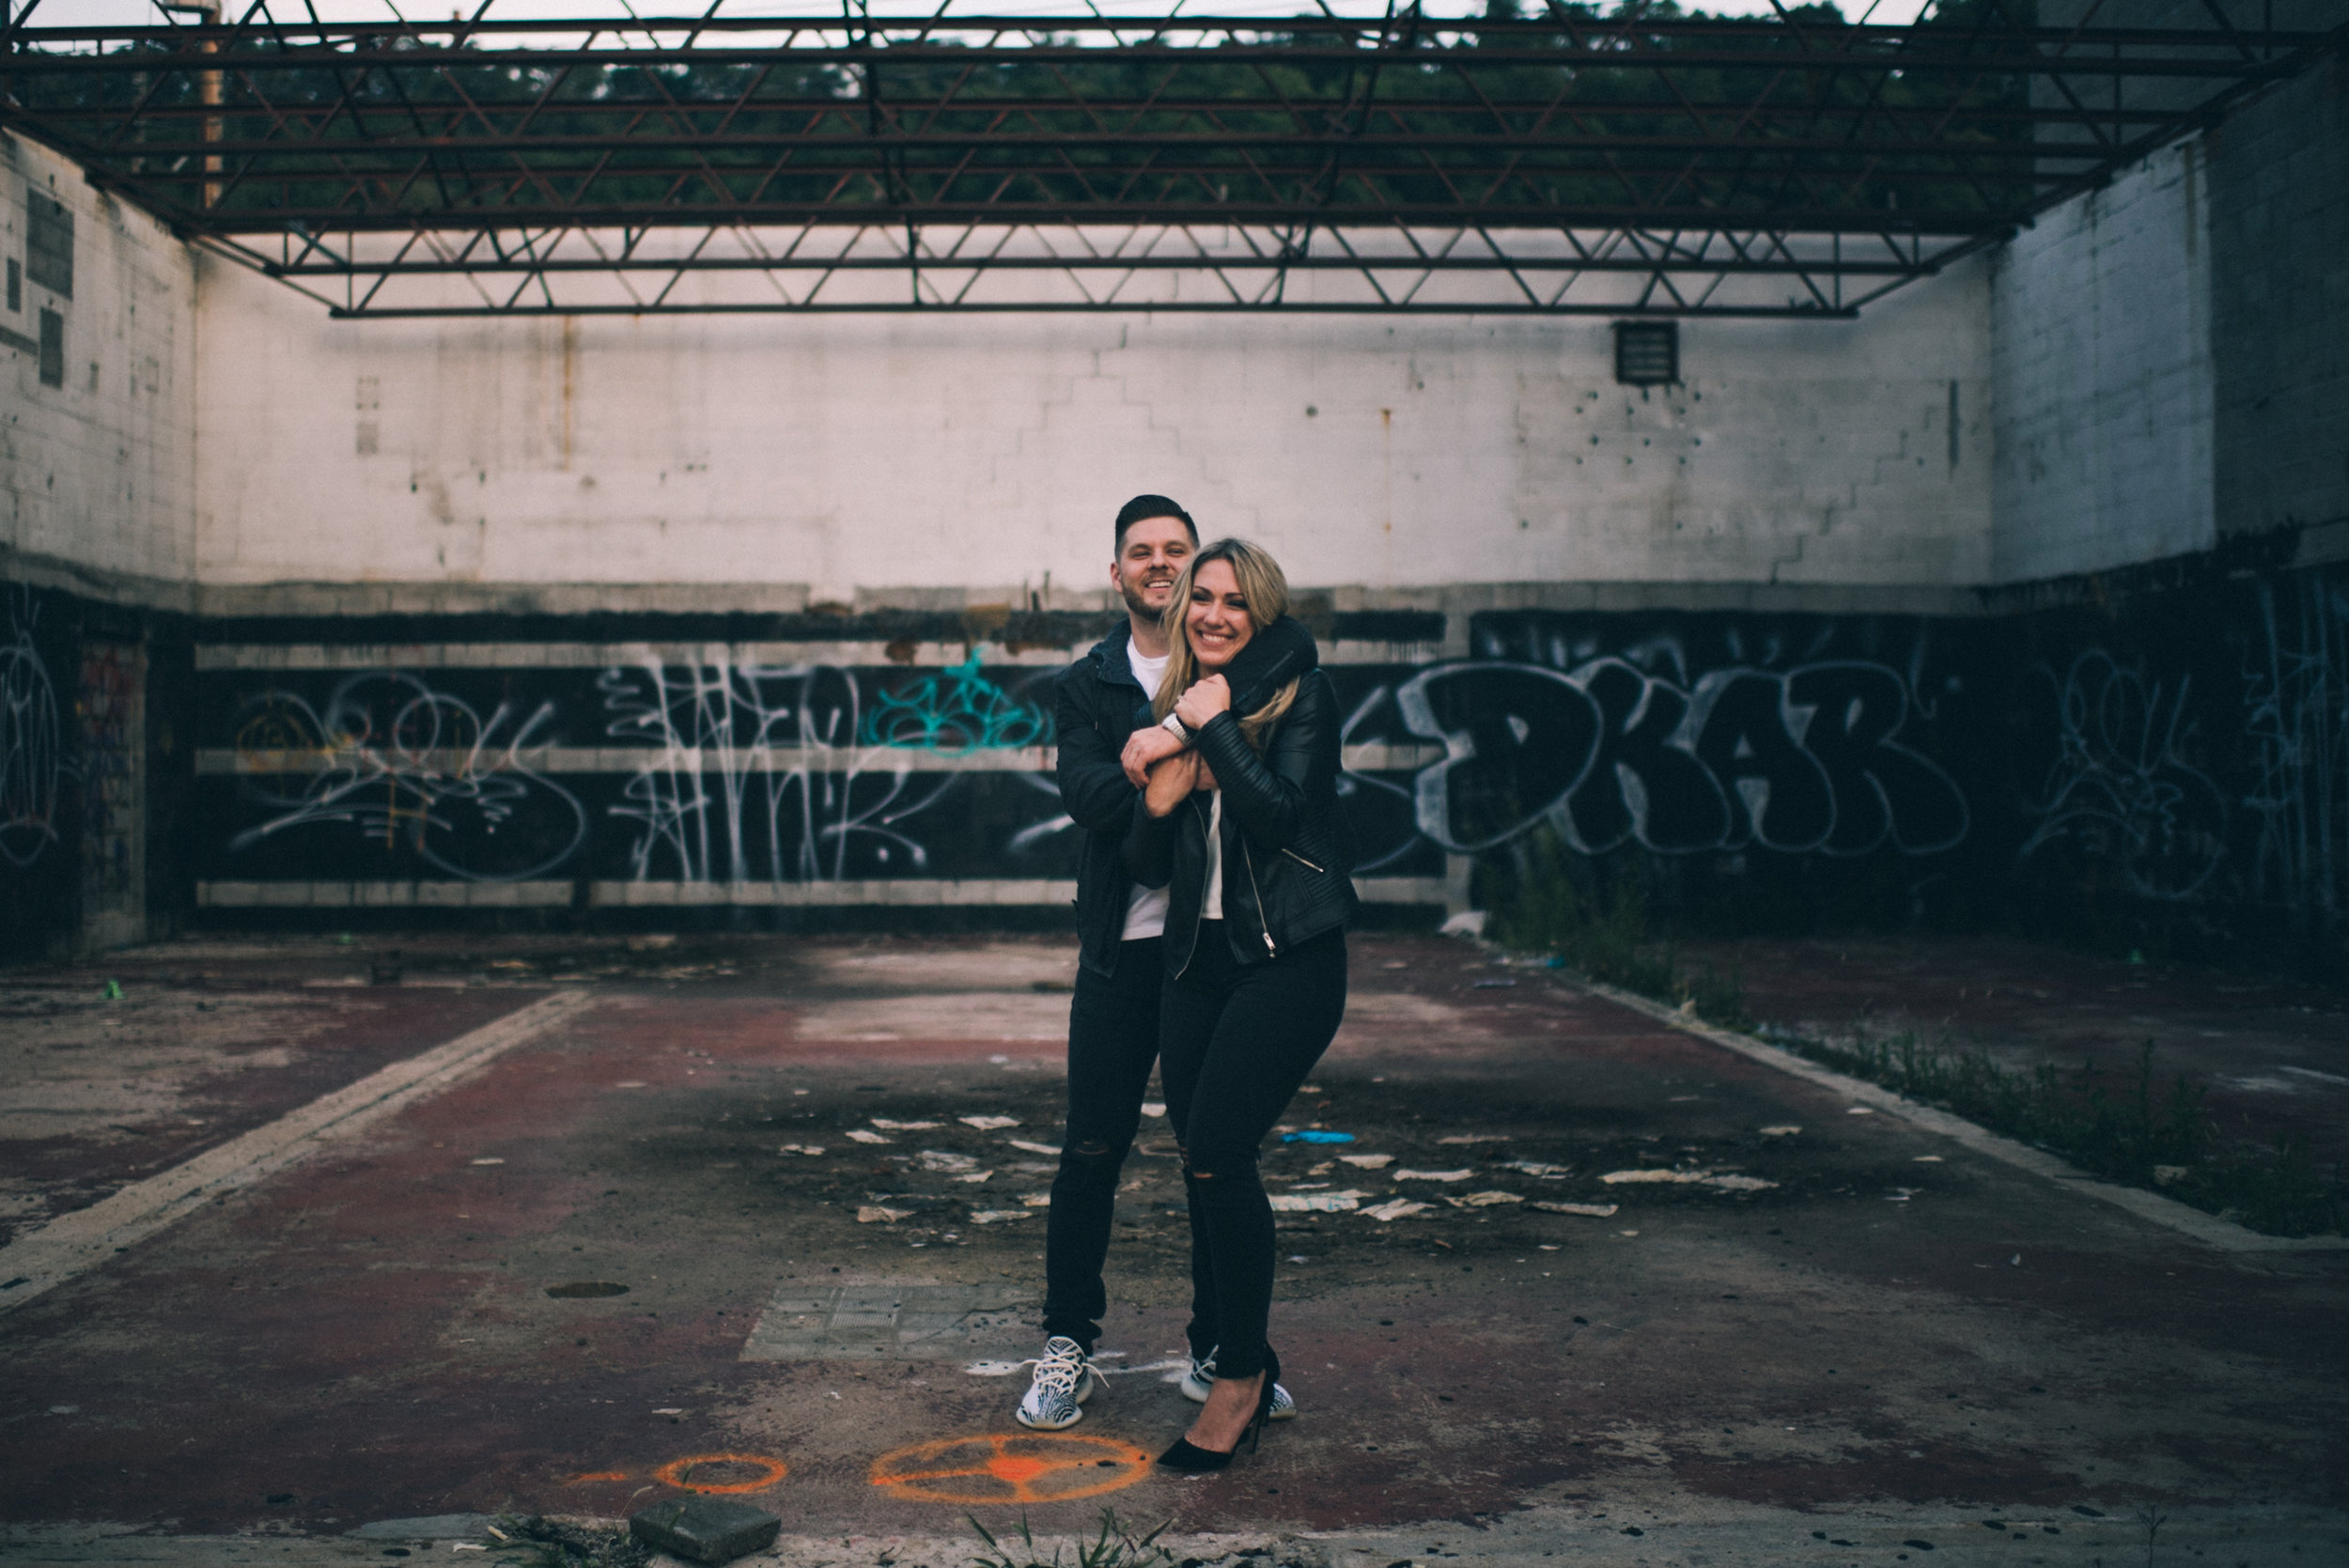 Pittsburgh Wedding Photographer - Stirpe-153.jpg